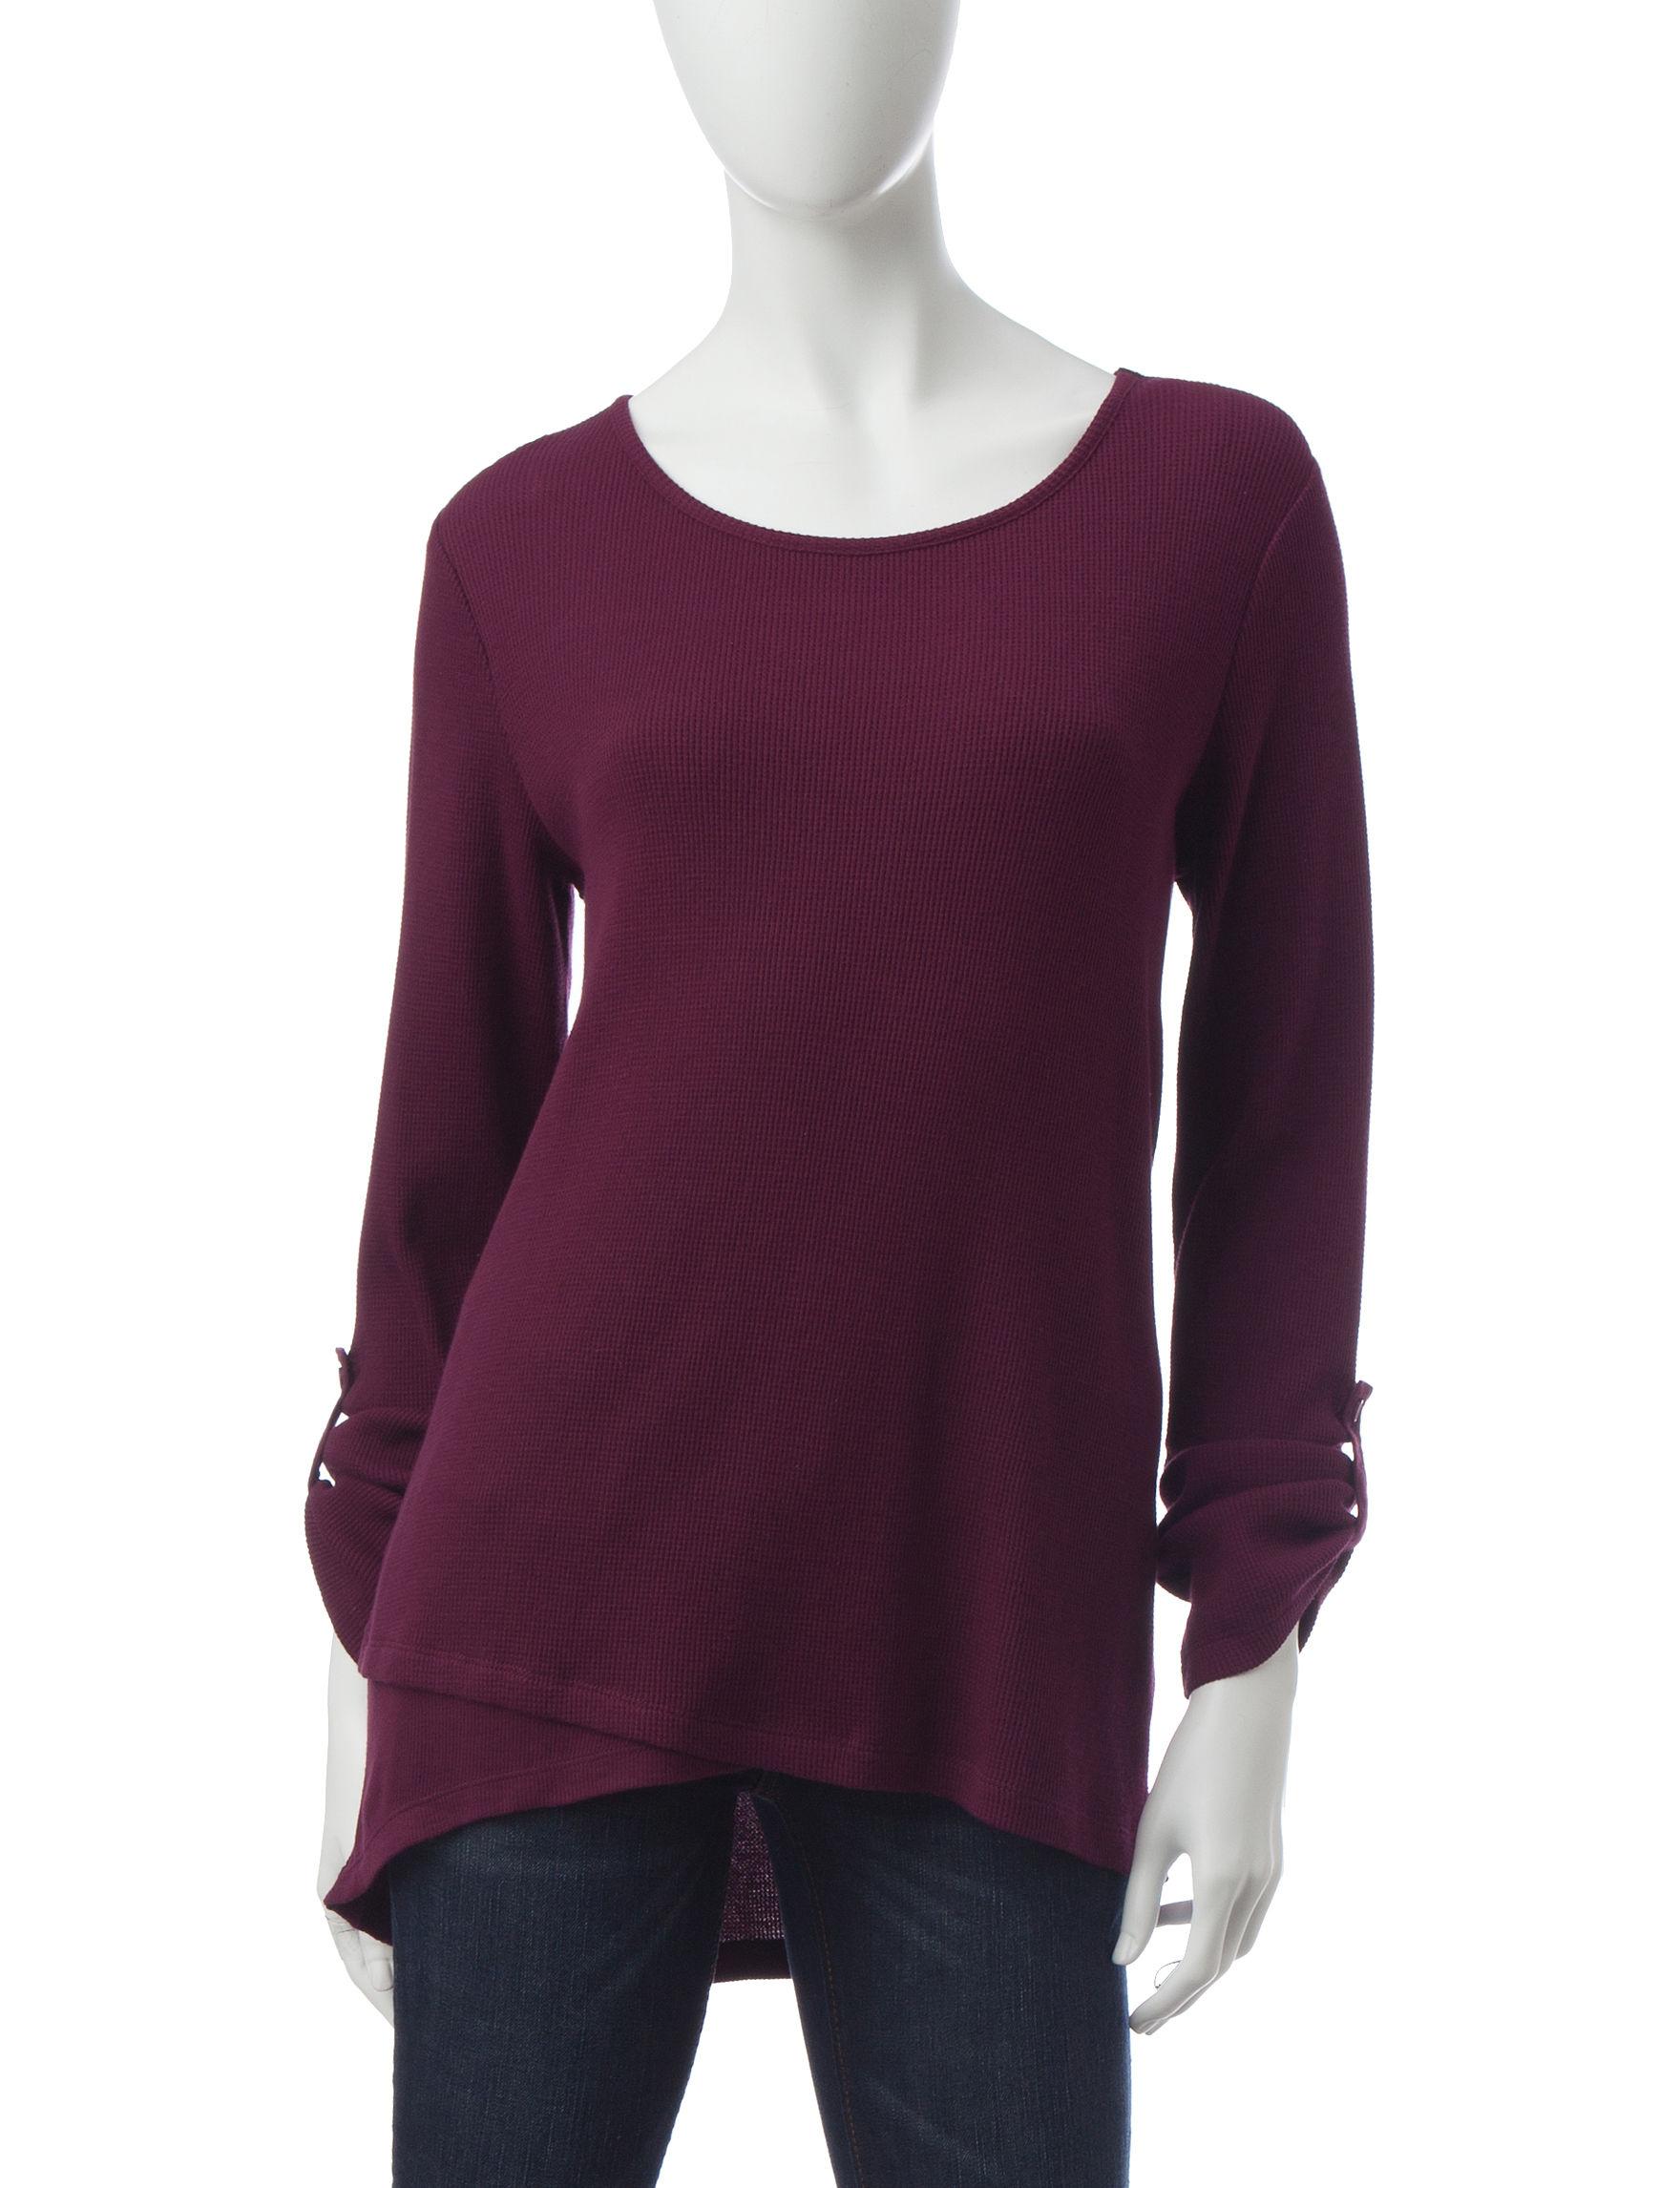 Signature Studio Burgundy Shirts & Blouses